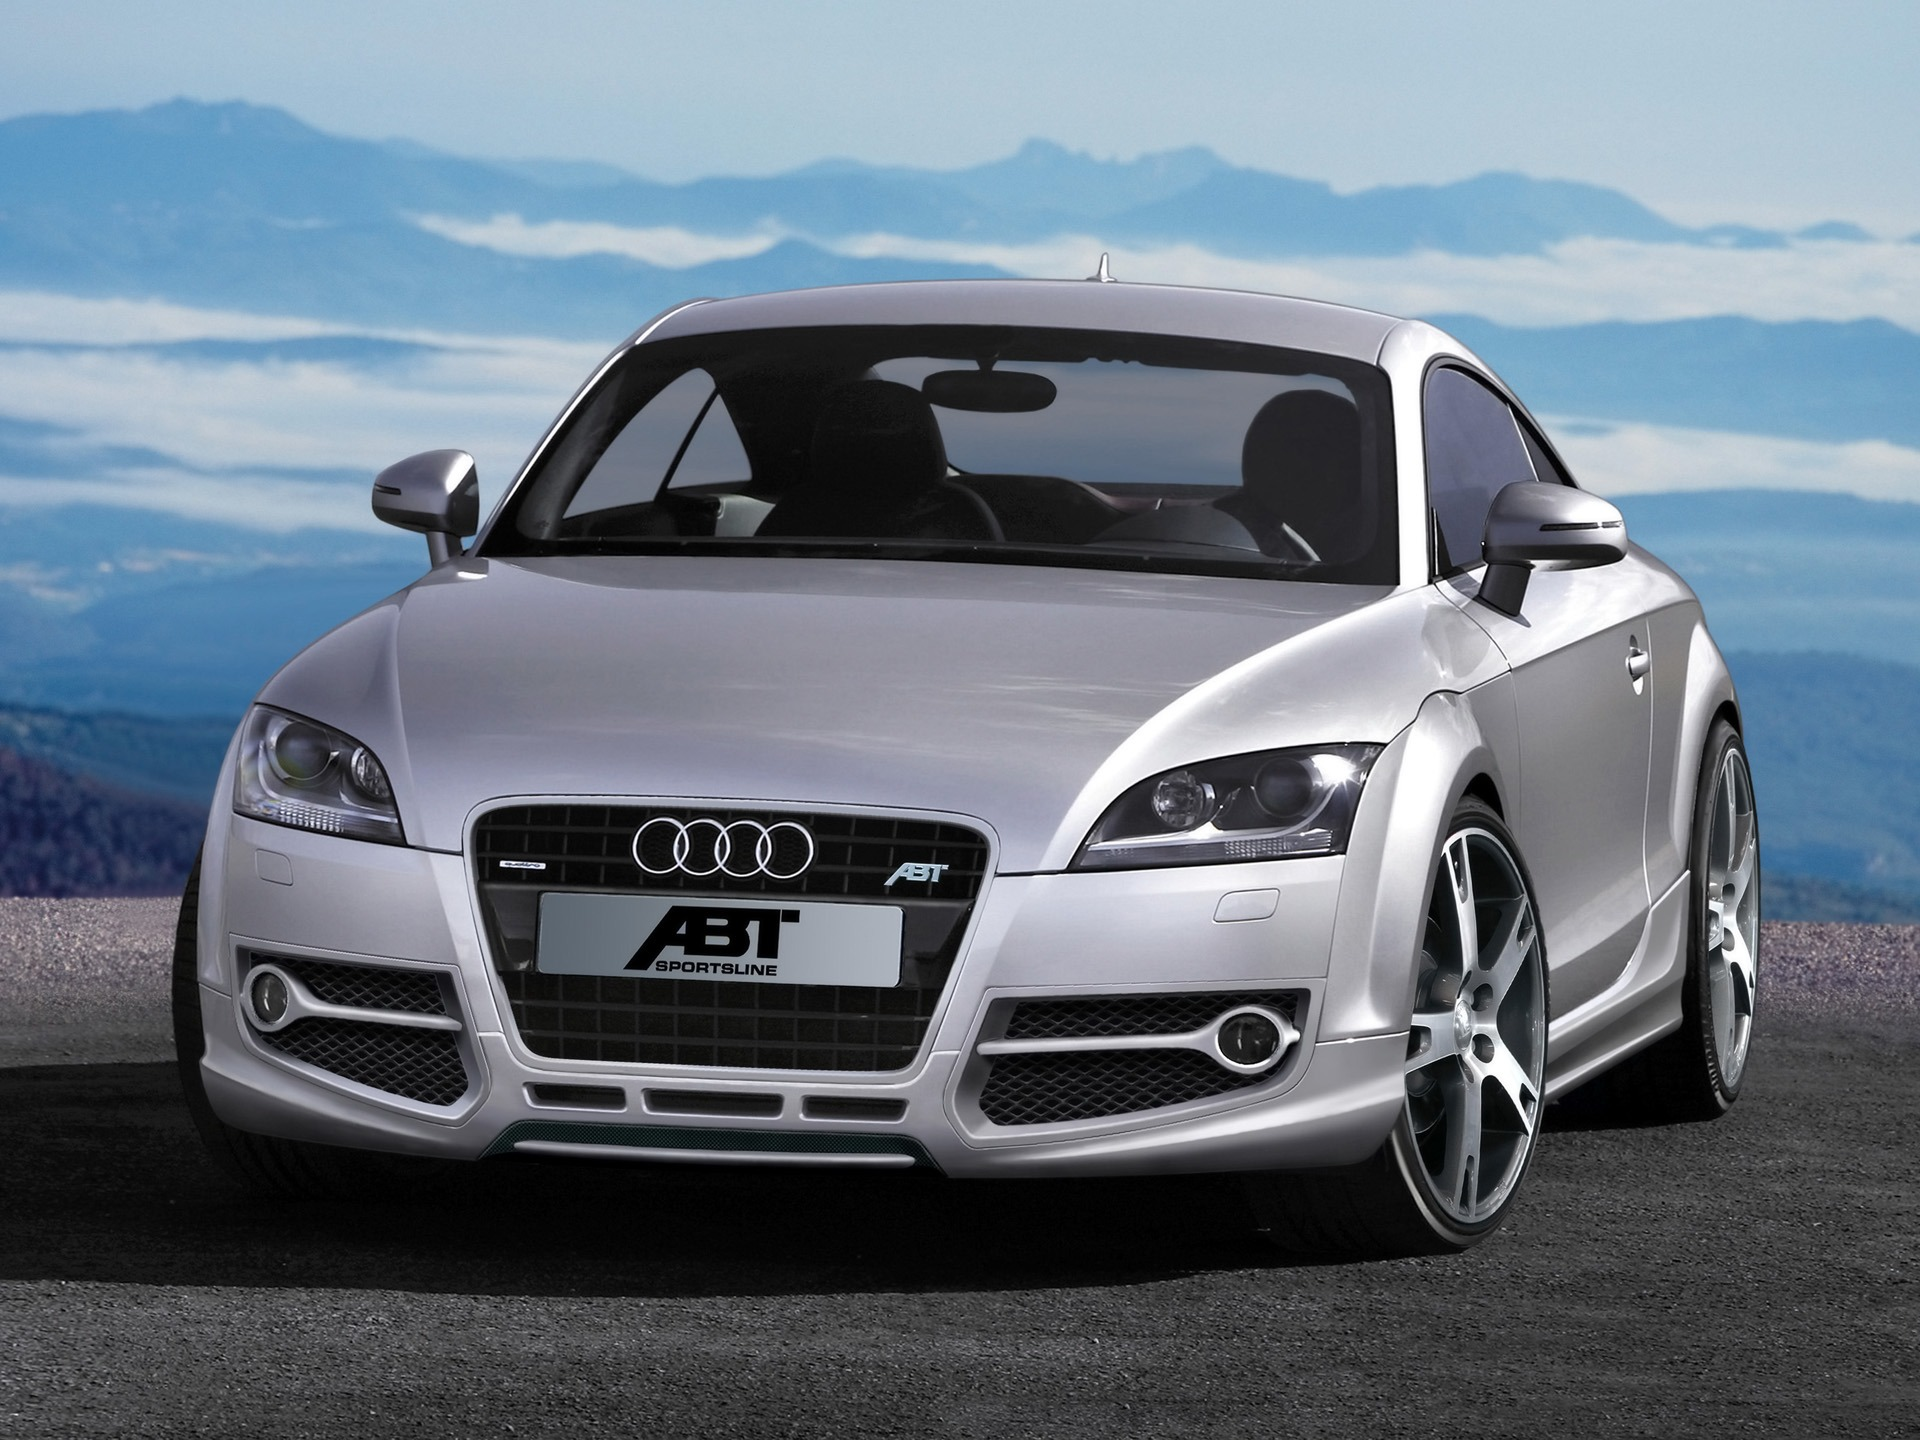 Audi Tt Wallpaper Audi Cars Wallpapers In Jpg Format For